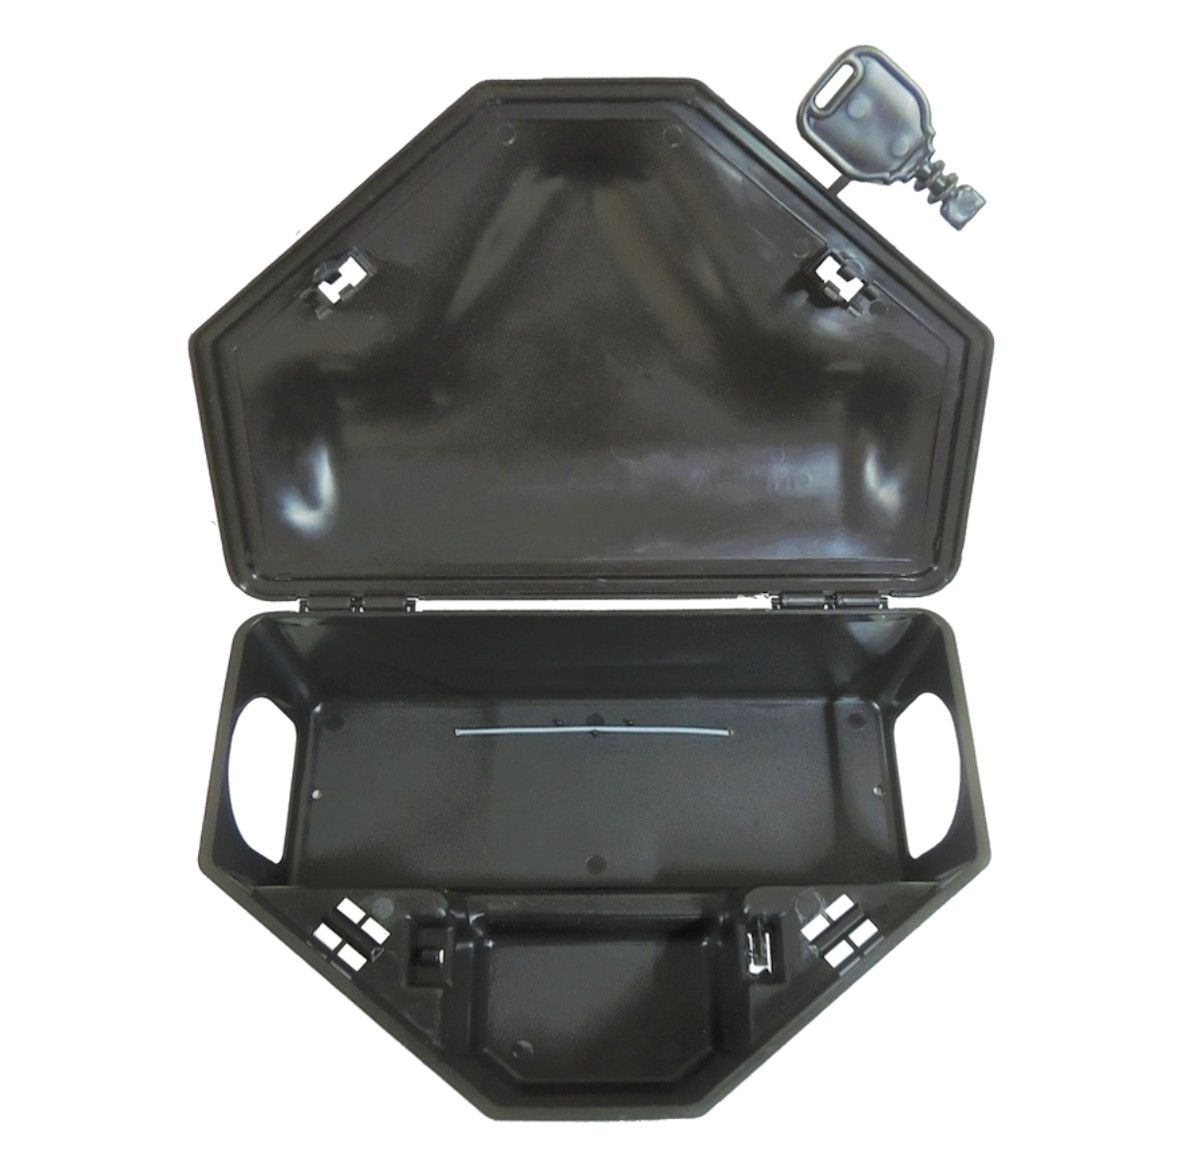 Kit 7 Porta Isca Com Chave - Super Reforçado